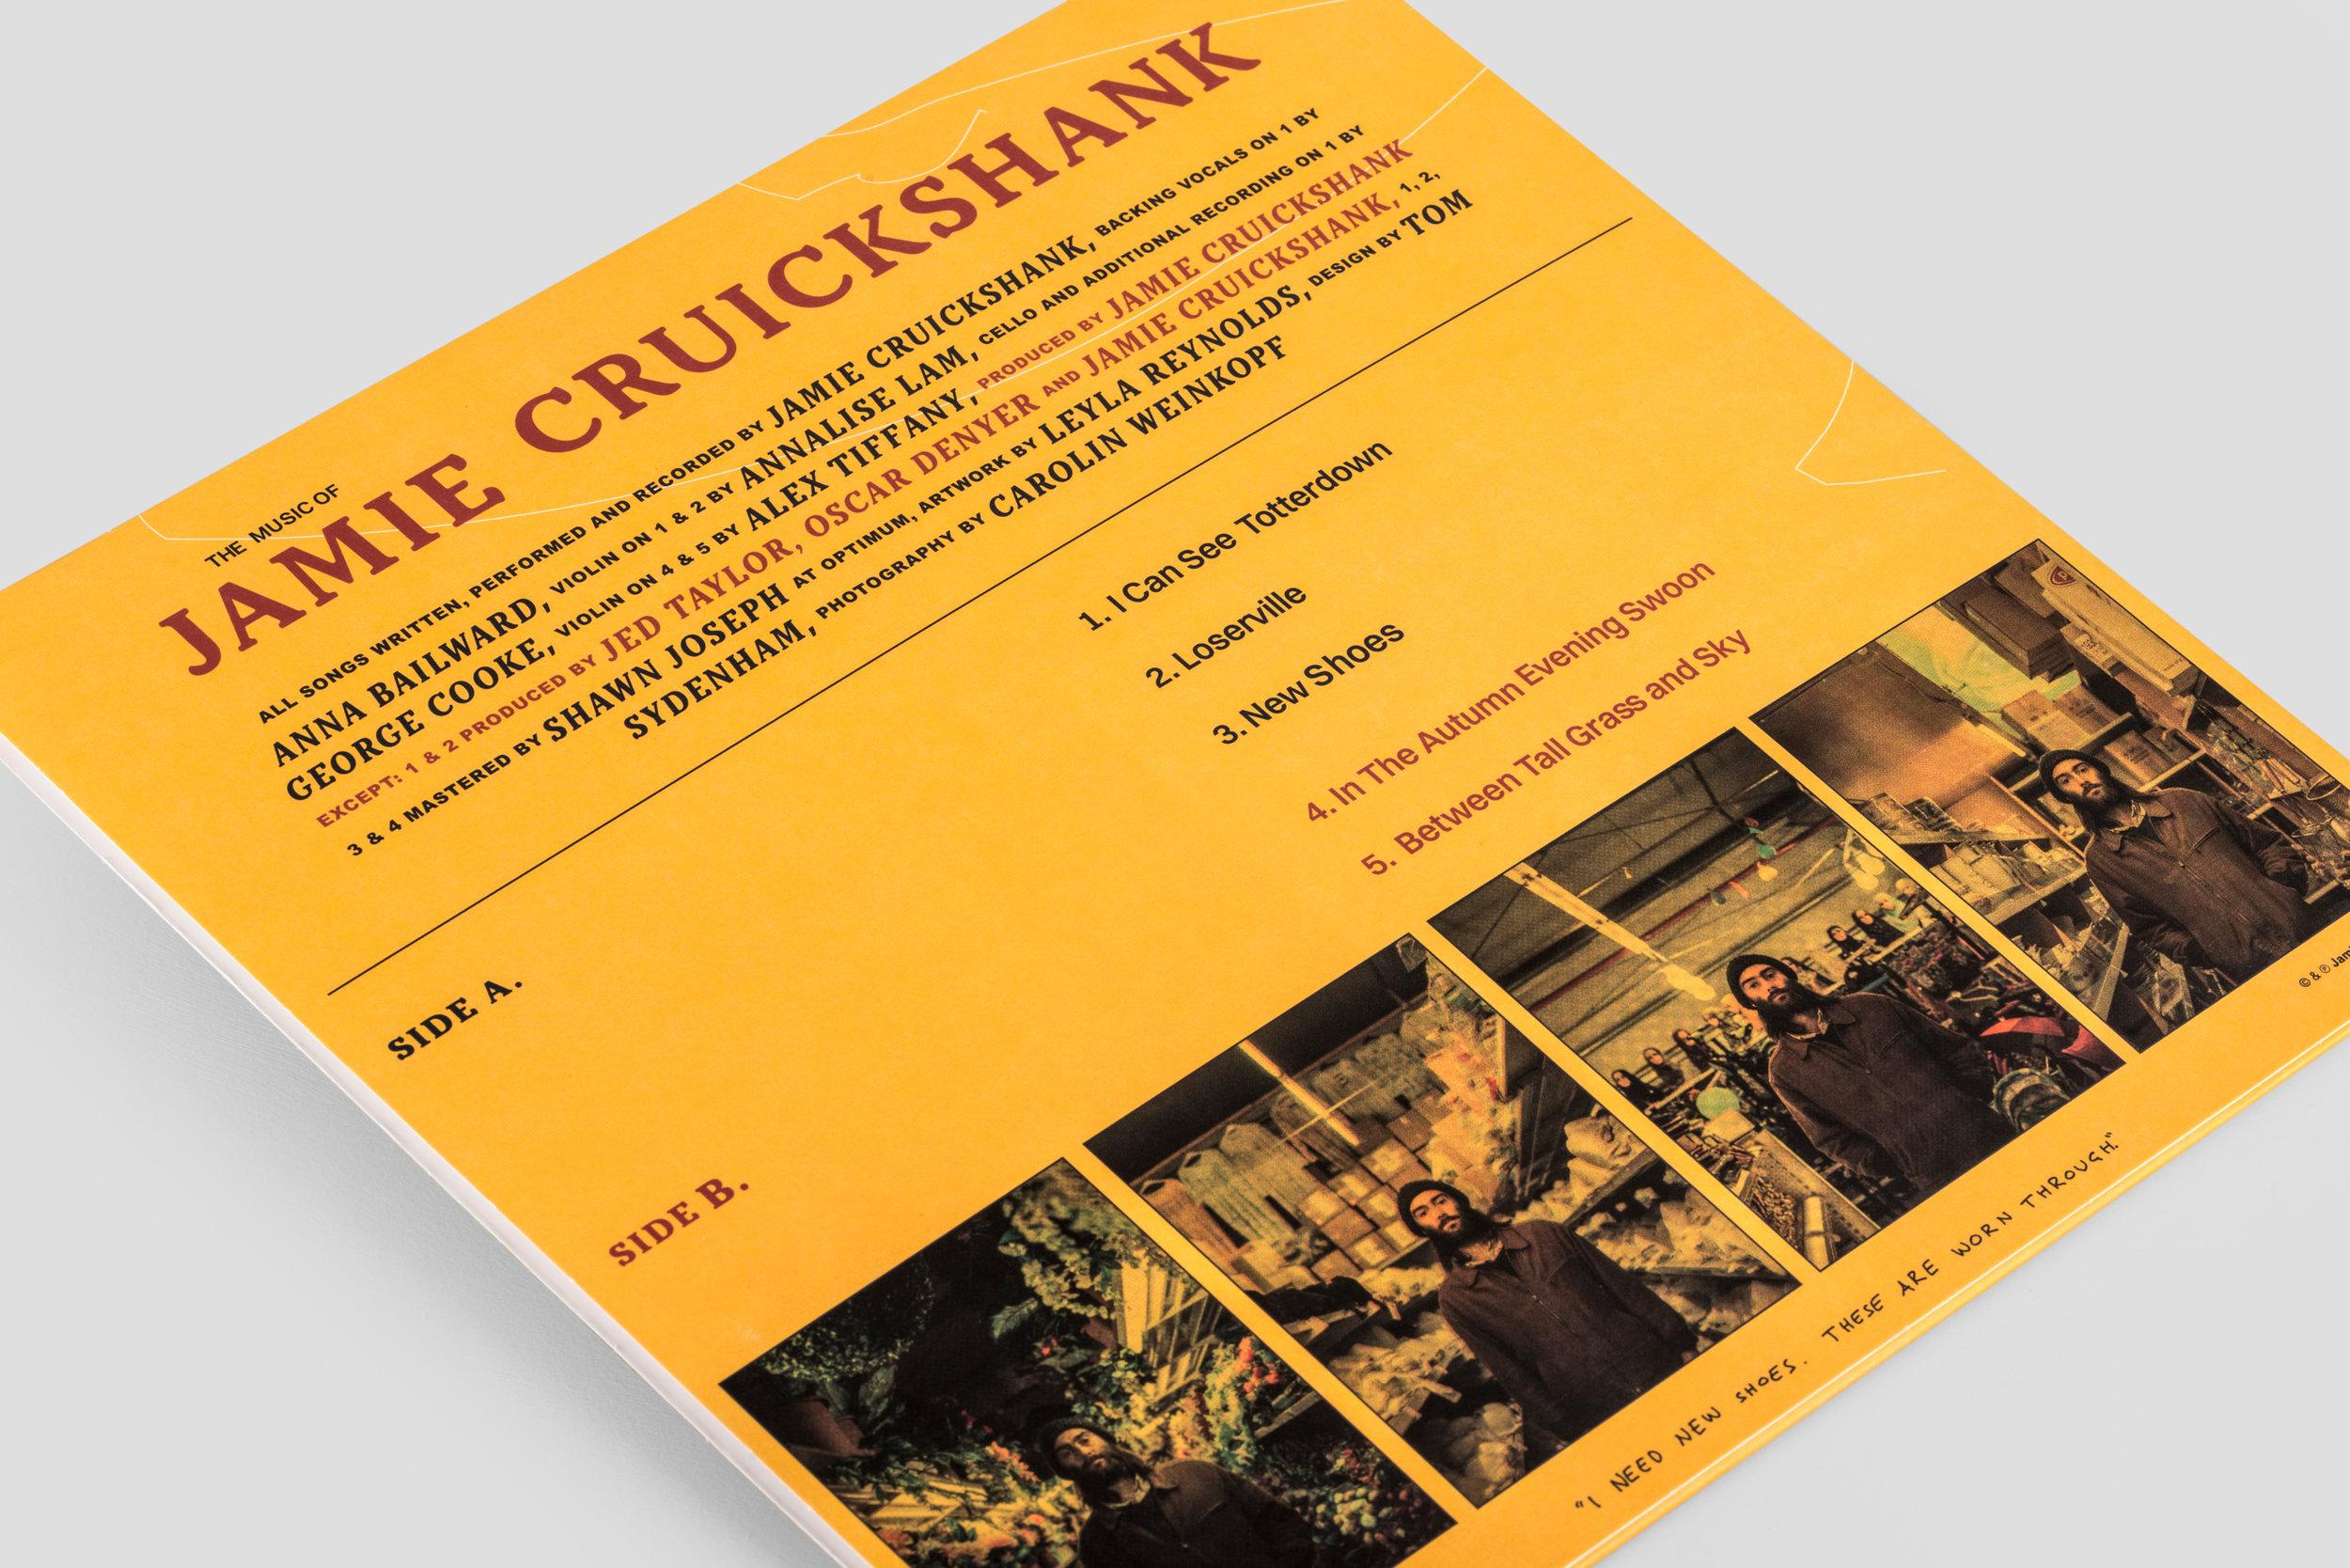 Jamie_Cruickshank_Tom_Sydenham_Design_3.jpg